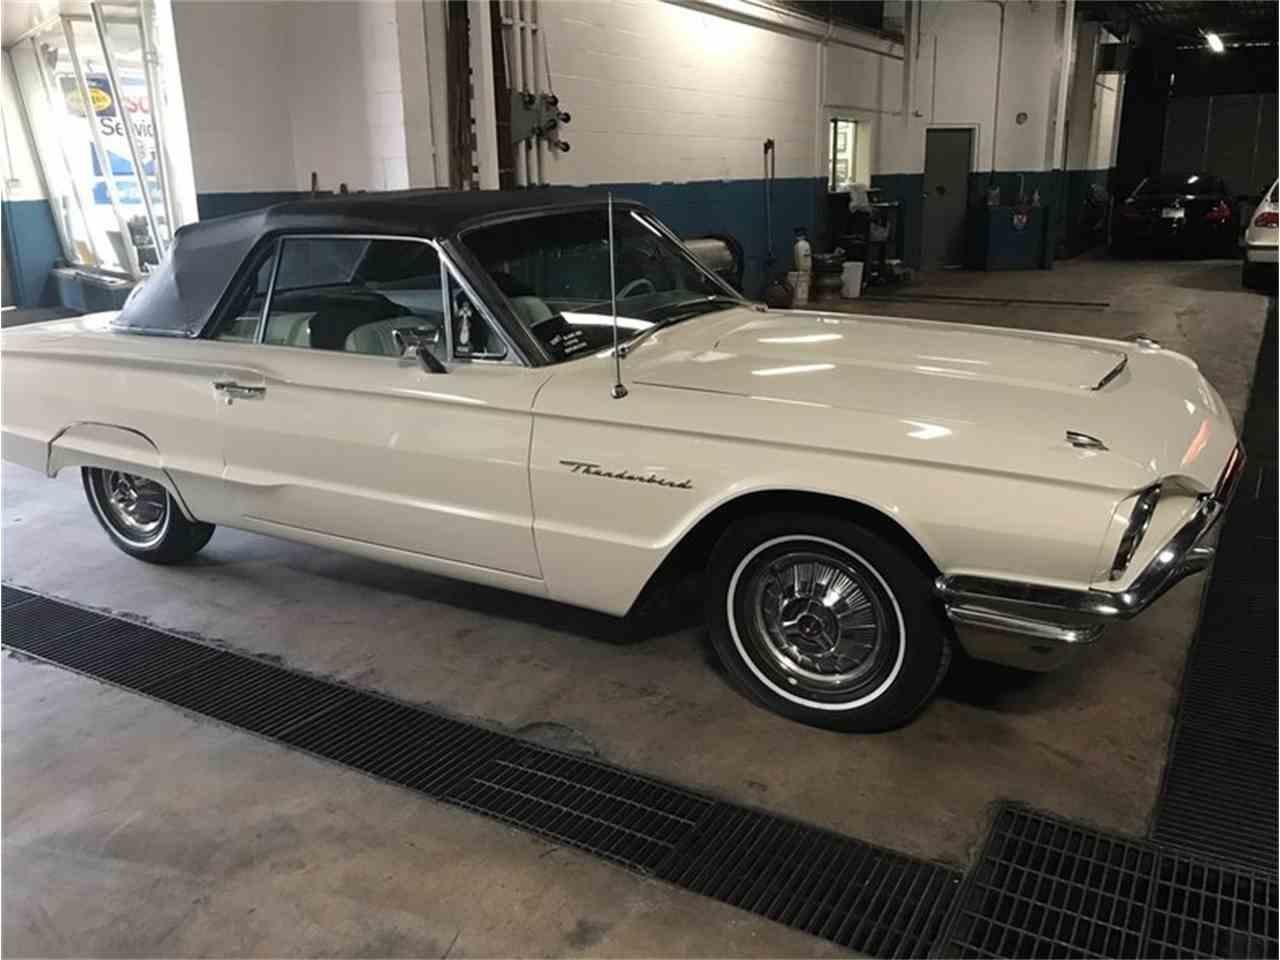 1964 Ford Thunderbird for Sale | ClassicCars.com | CC-1034695